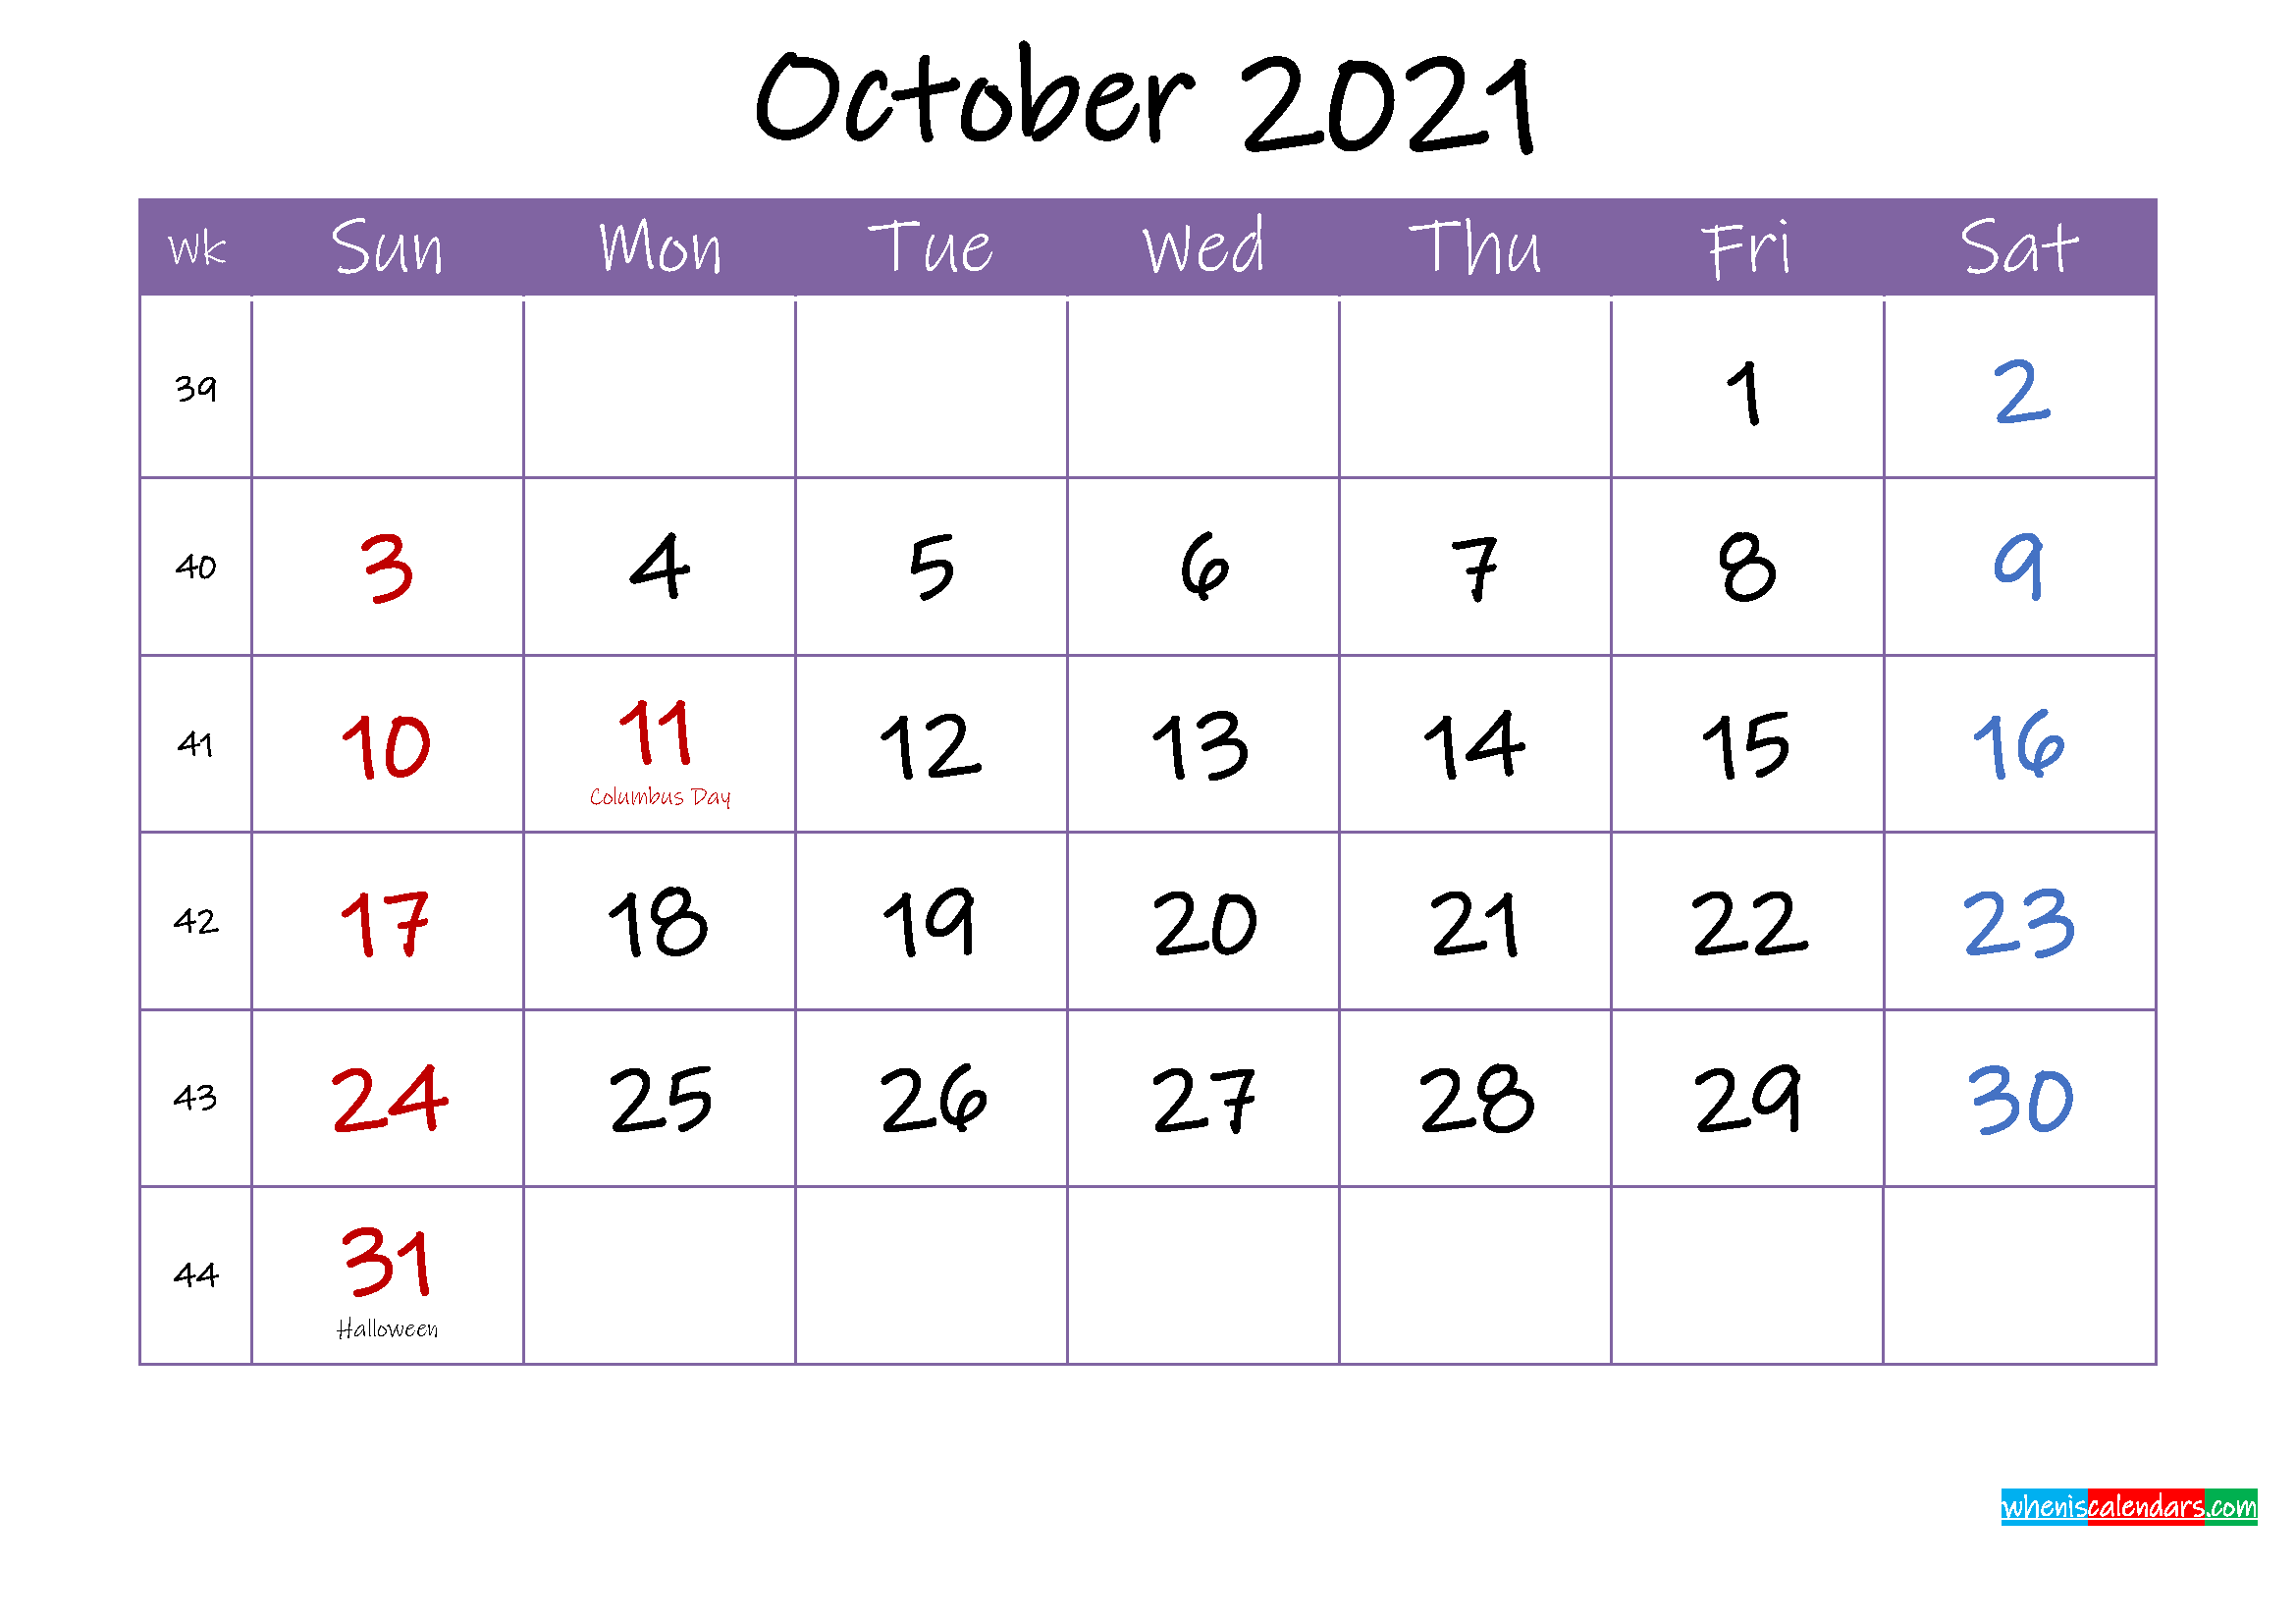 October 2021 Calendar with Holidays Printable